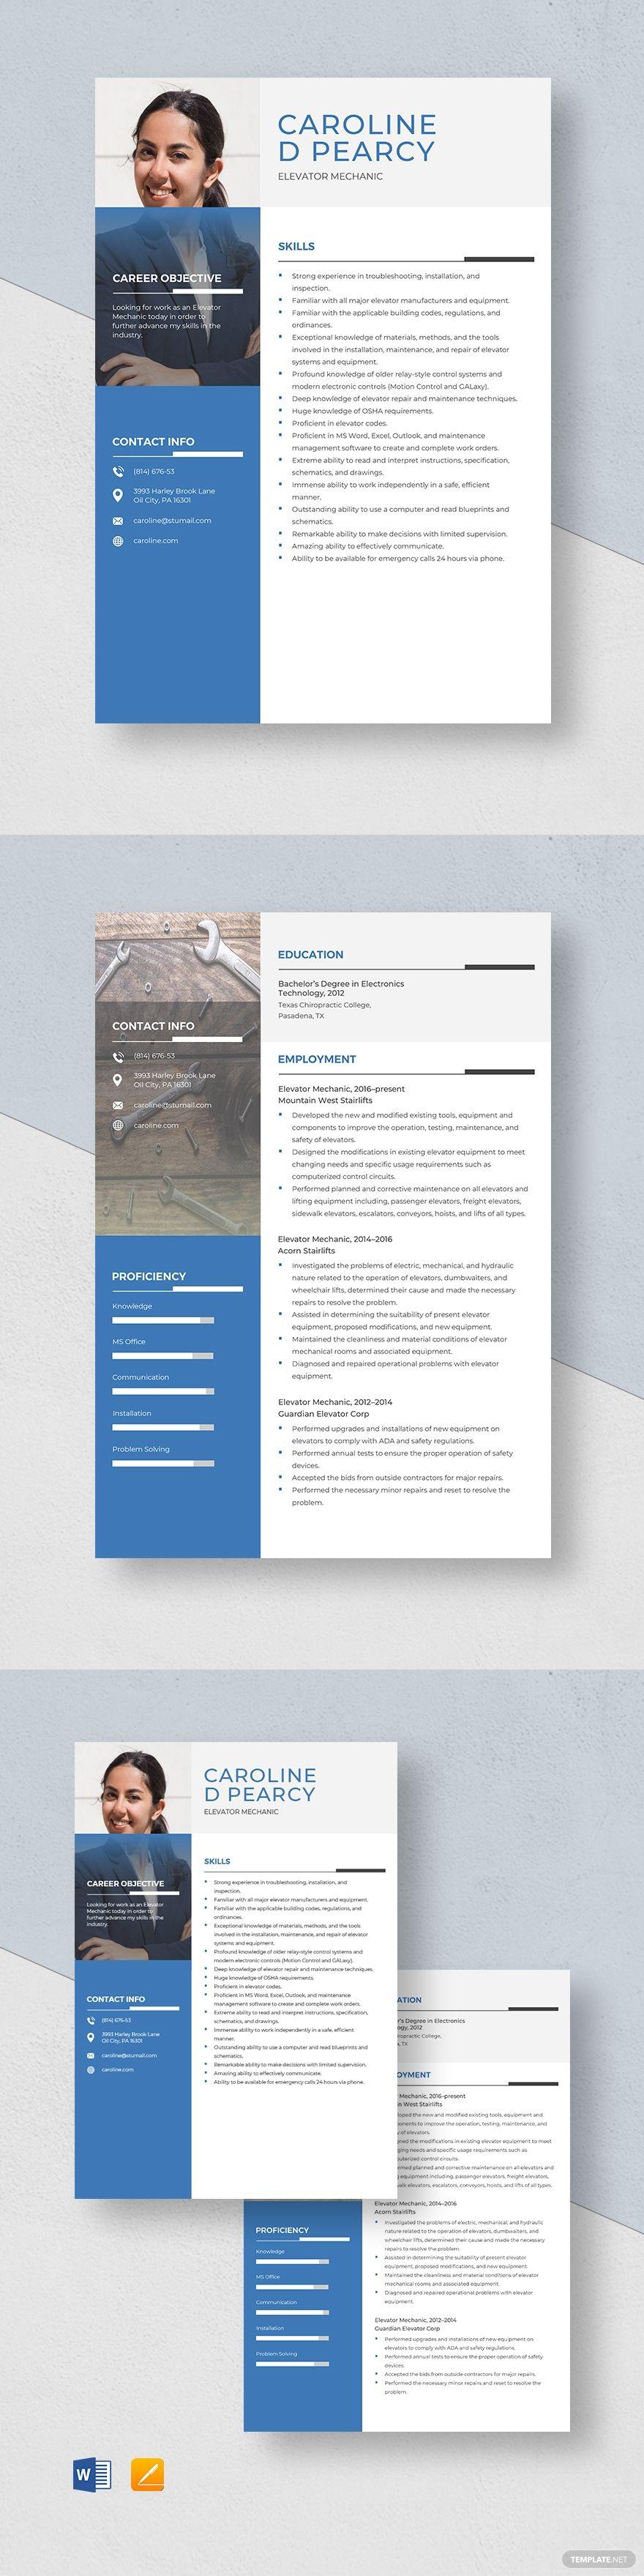 Elevator Mechanic Resume Template Ad Ad Mechanic Elevator Template Resume In 2020 Resume Template Website Template Design Resume